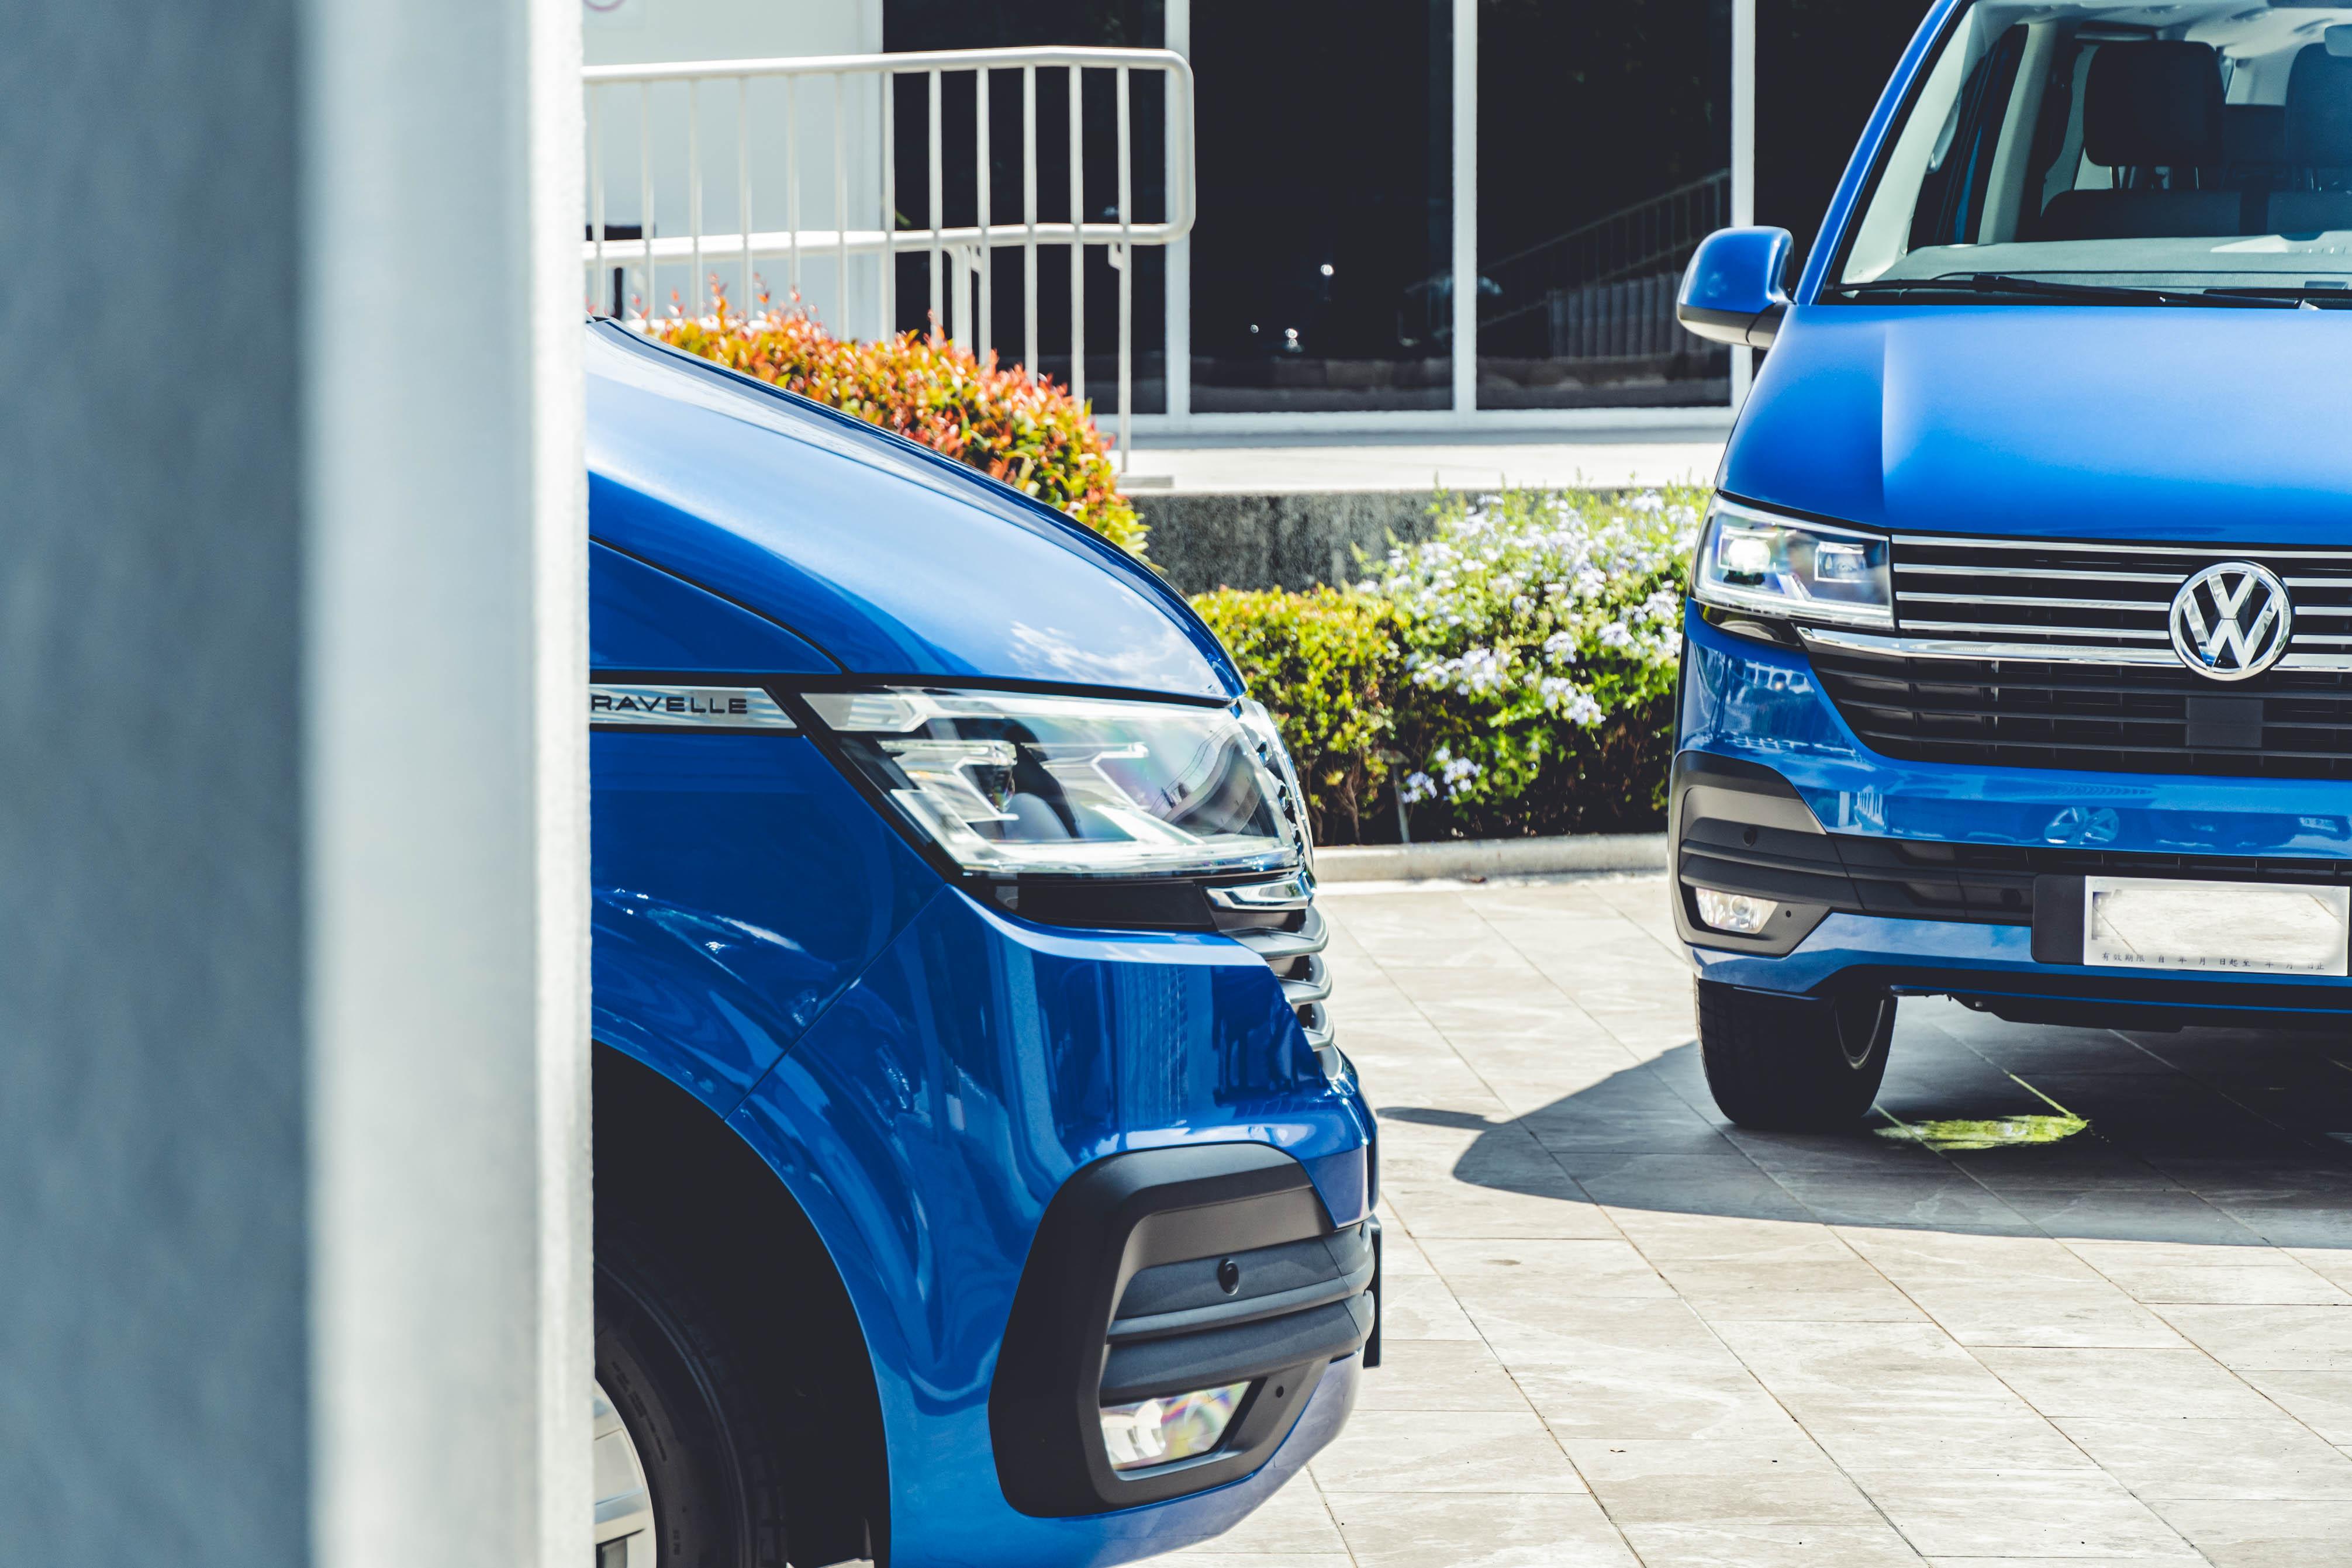 VWCV T6.1 Caravelle 以五車型販售,售價 140.3 到 210.8 萬元。